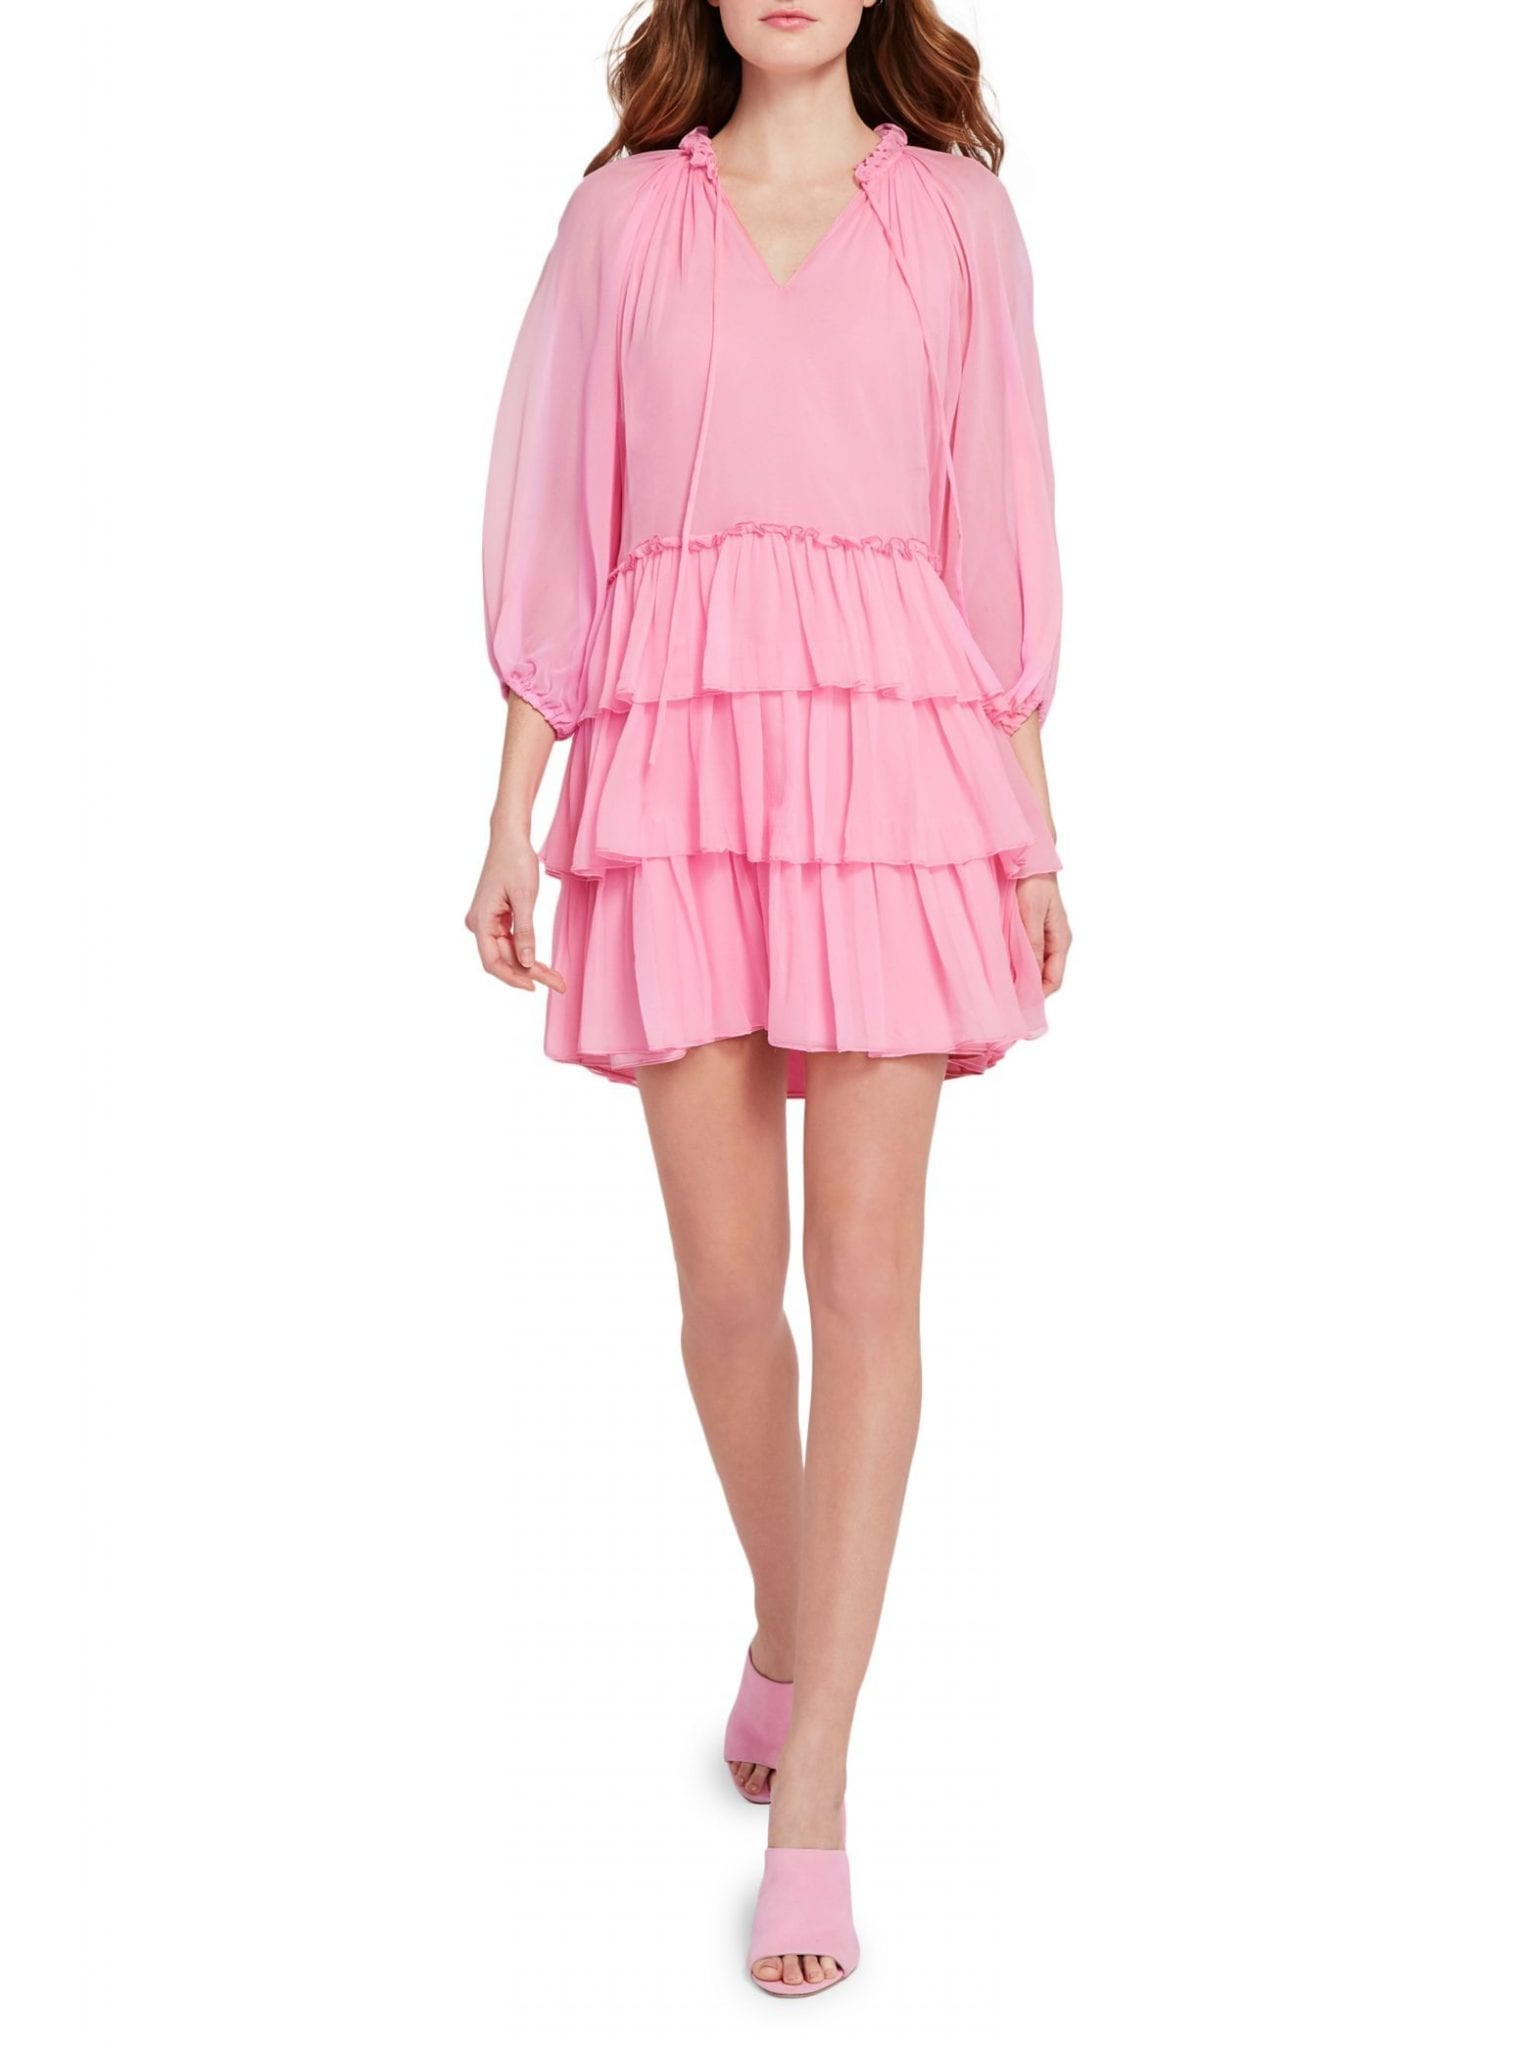 ALICE + OLIVIA Layla Puff-Sleeve Silk Tiered Mini Dress